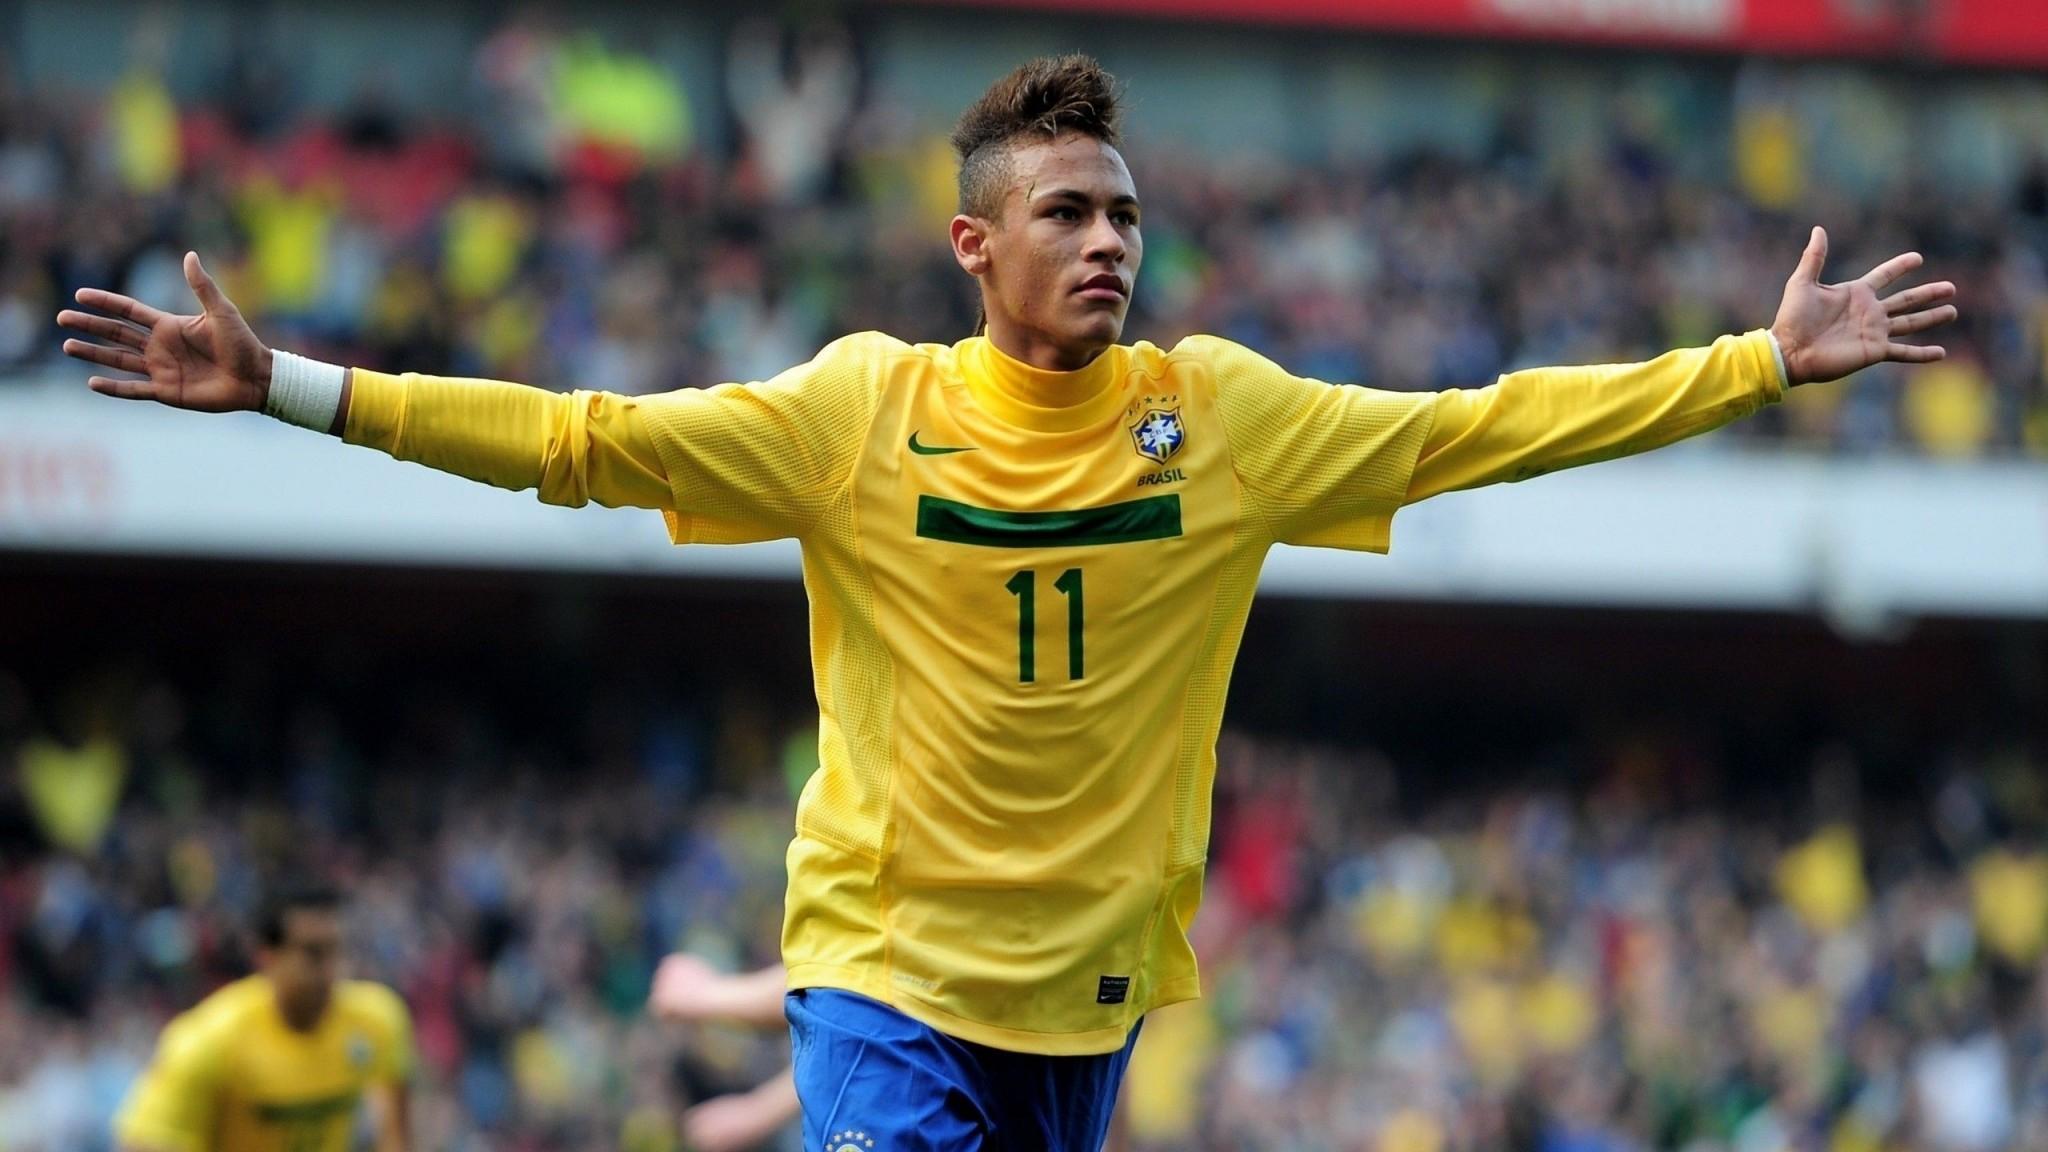 Neymar da silva santos junior   The  HD Wallpaper